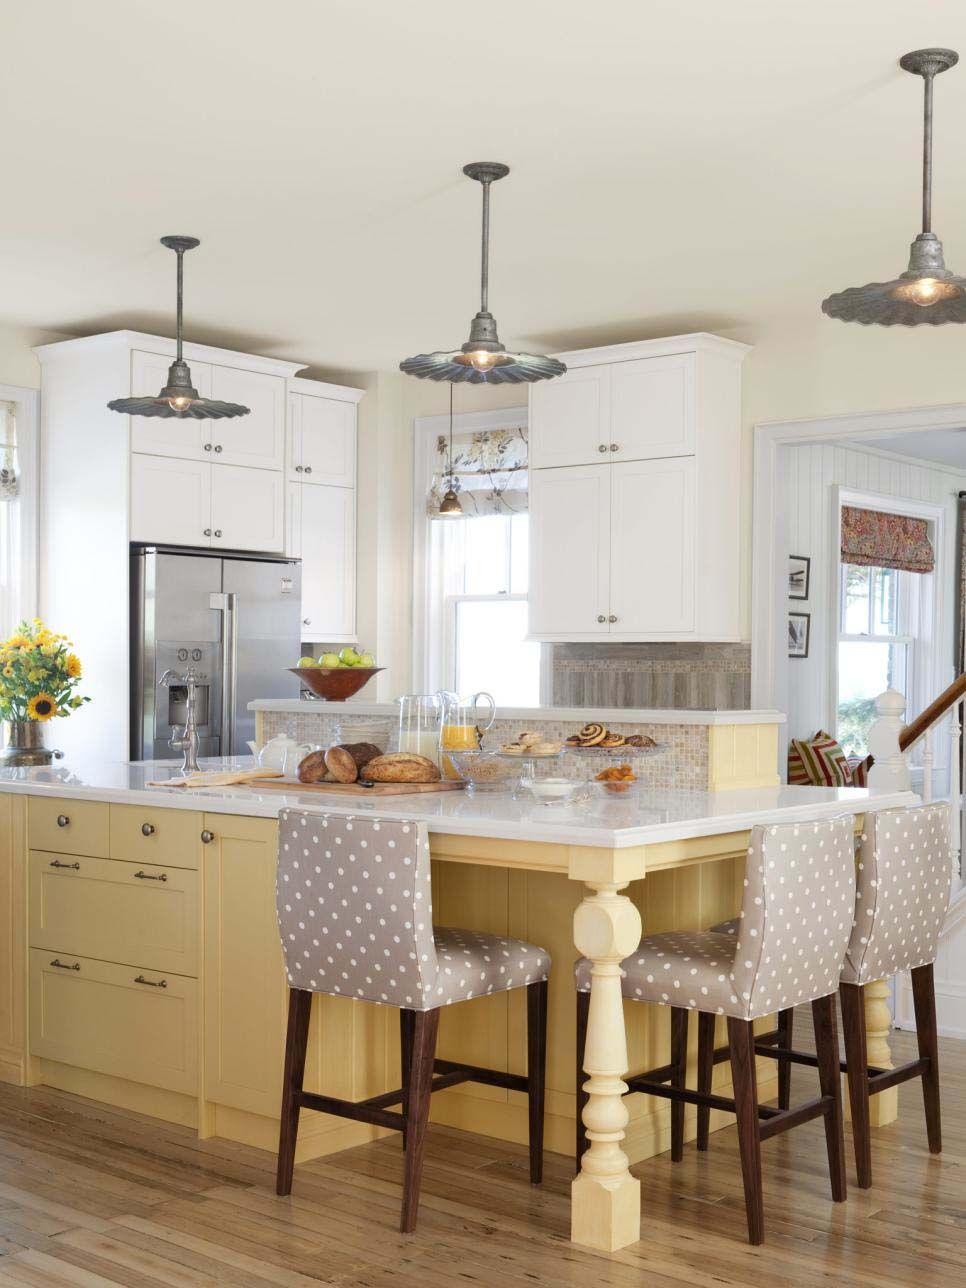 30+ Brilliant kitchen island ideas that make a statement   Islas de ...